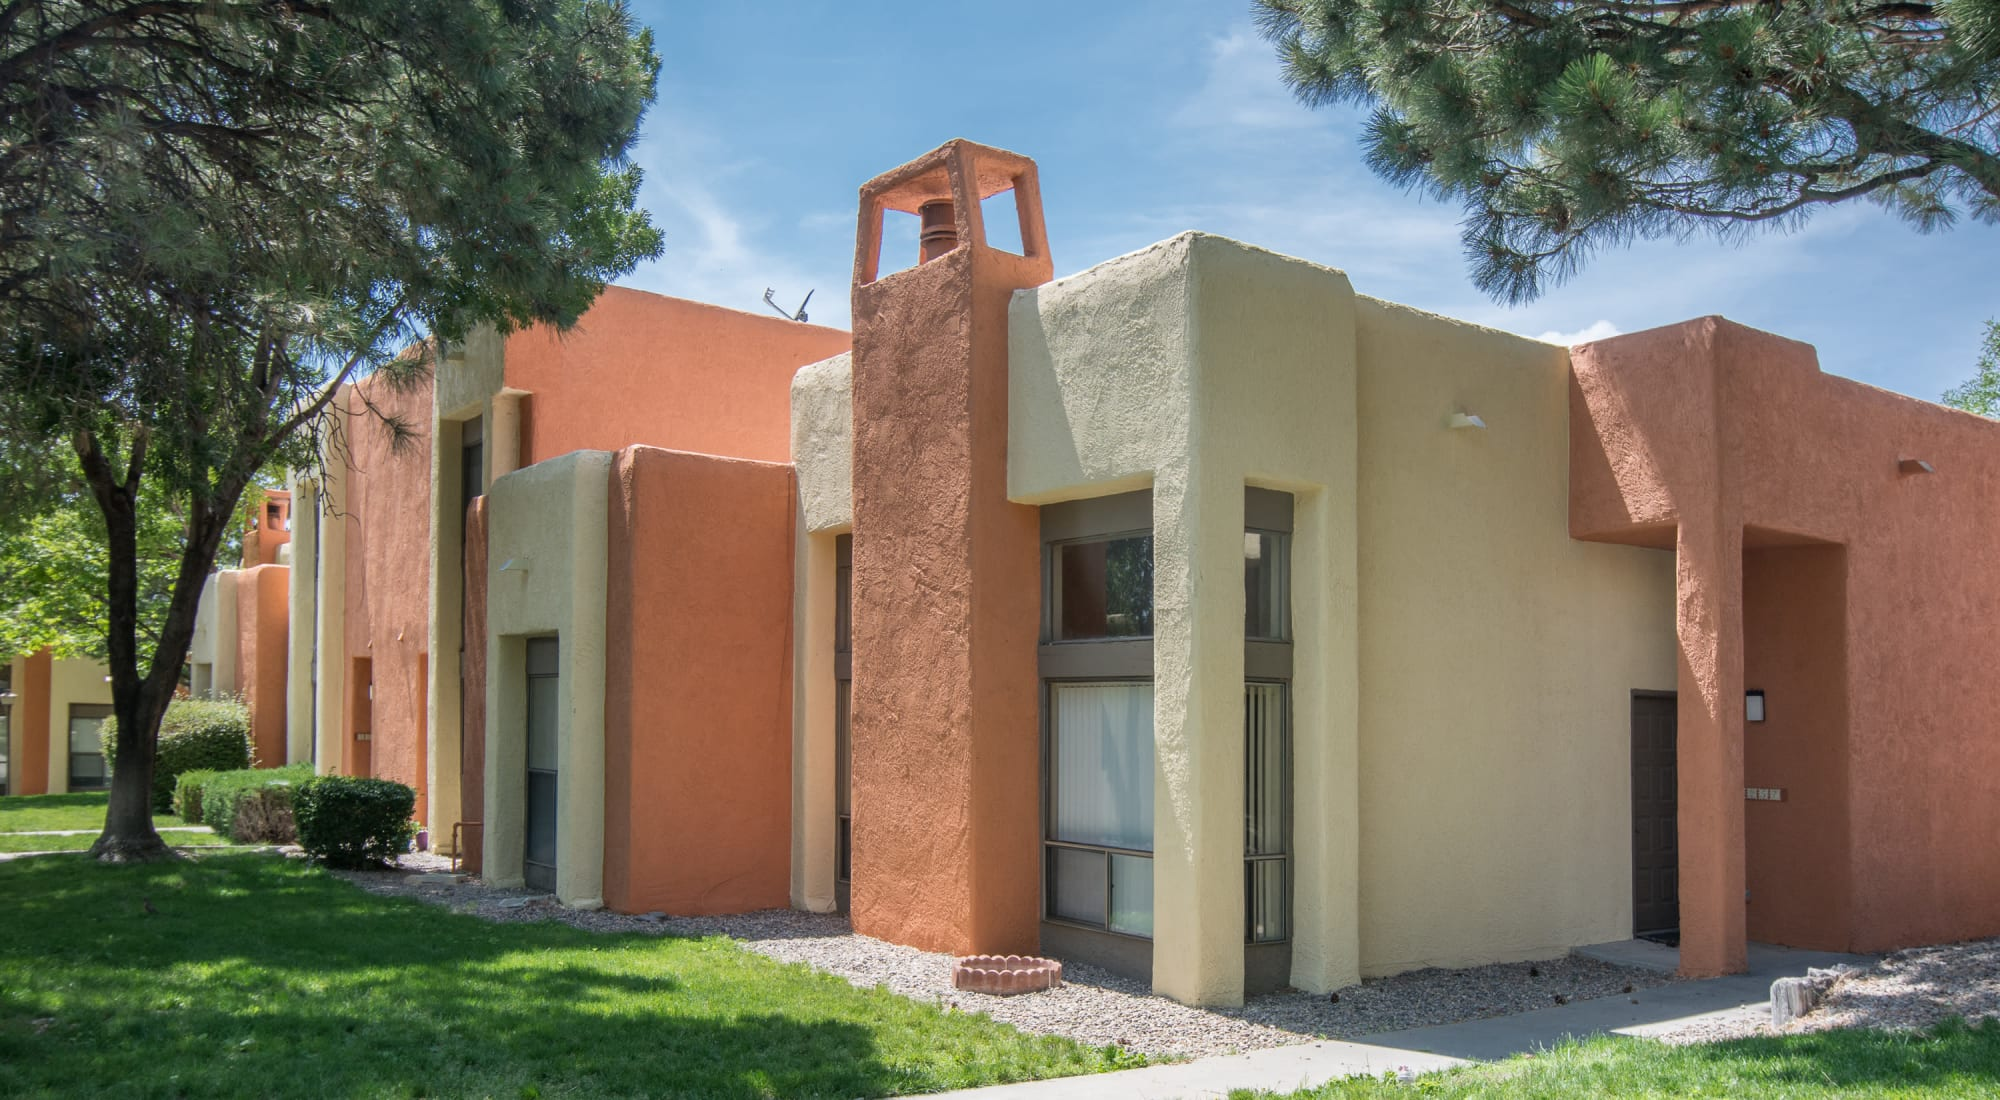 Apartments at Mesa Del Oso in Albuquerque, New Mexico